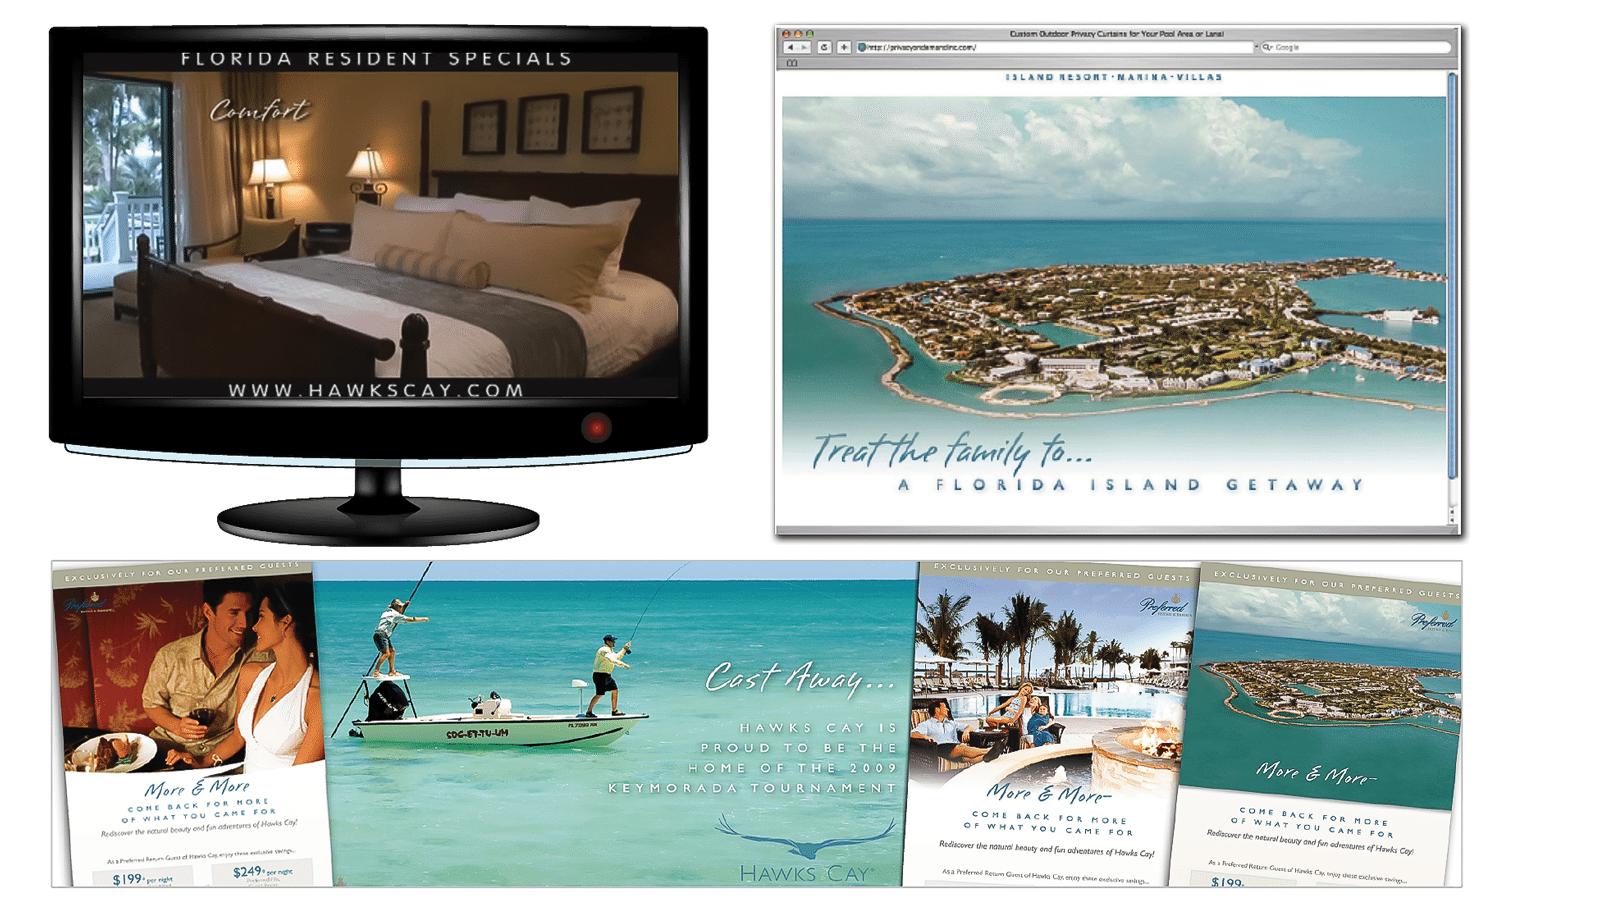 Hotel Marketing Agency - Hotel Marketing Campaign Creative for Hawks Cay